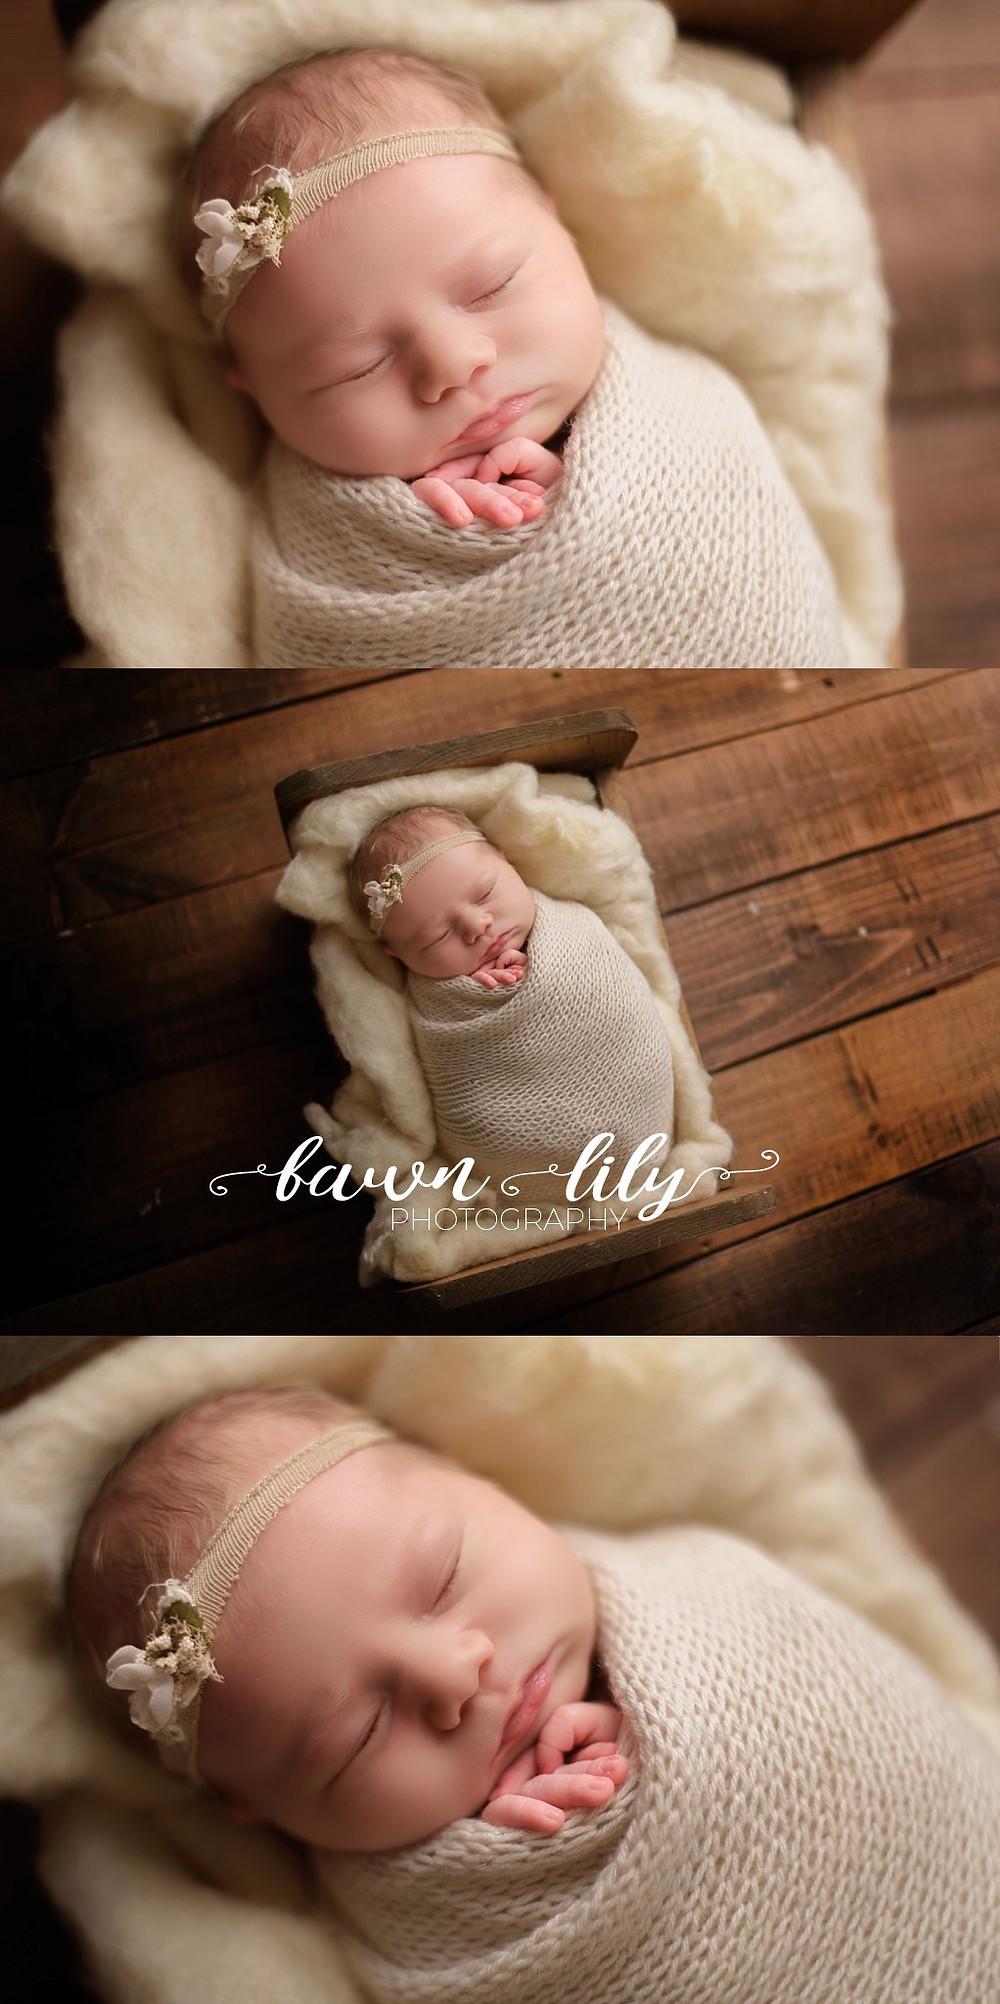 victoria bc newborn photographer, sidney bc newborn photographer, fawn lily photography, wrapped newborn photos